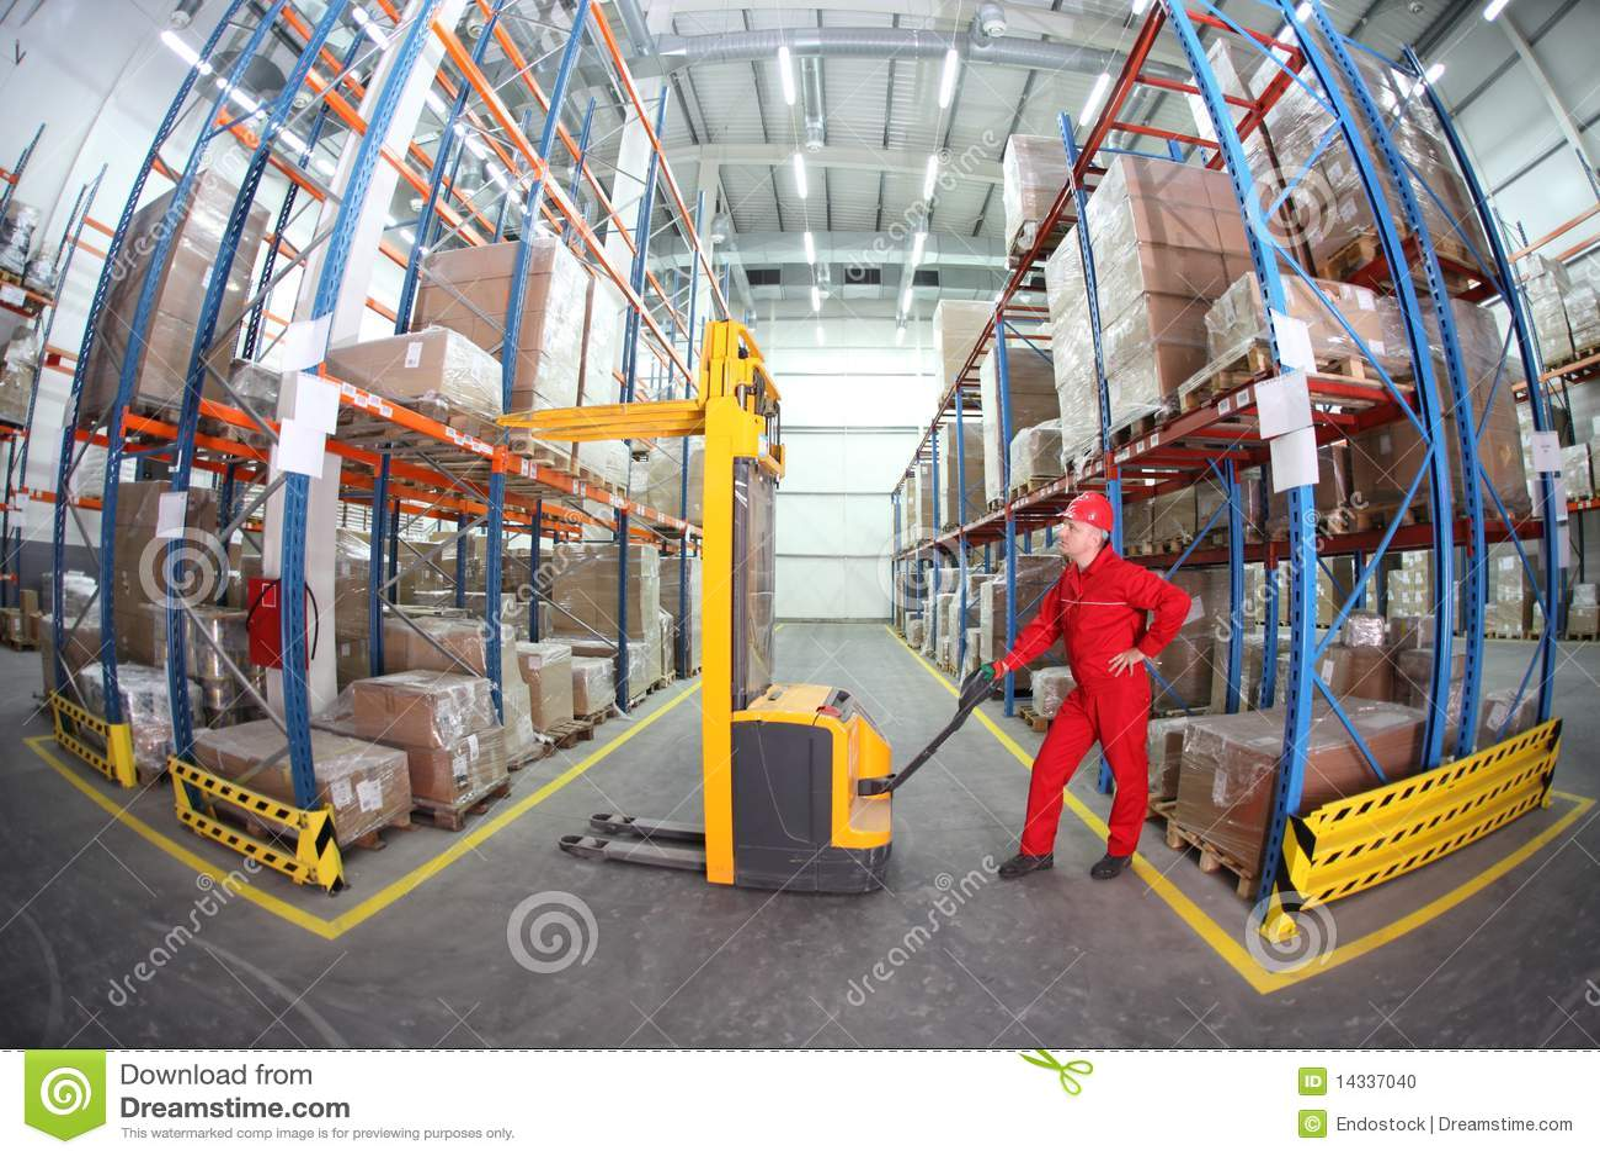 Warehousing - Manual Forklift Operator At Work In Stock Photo ...